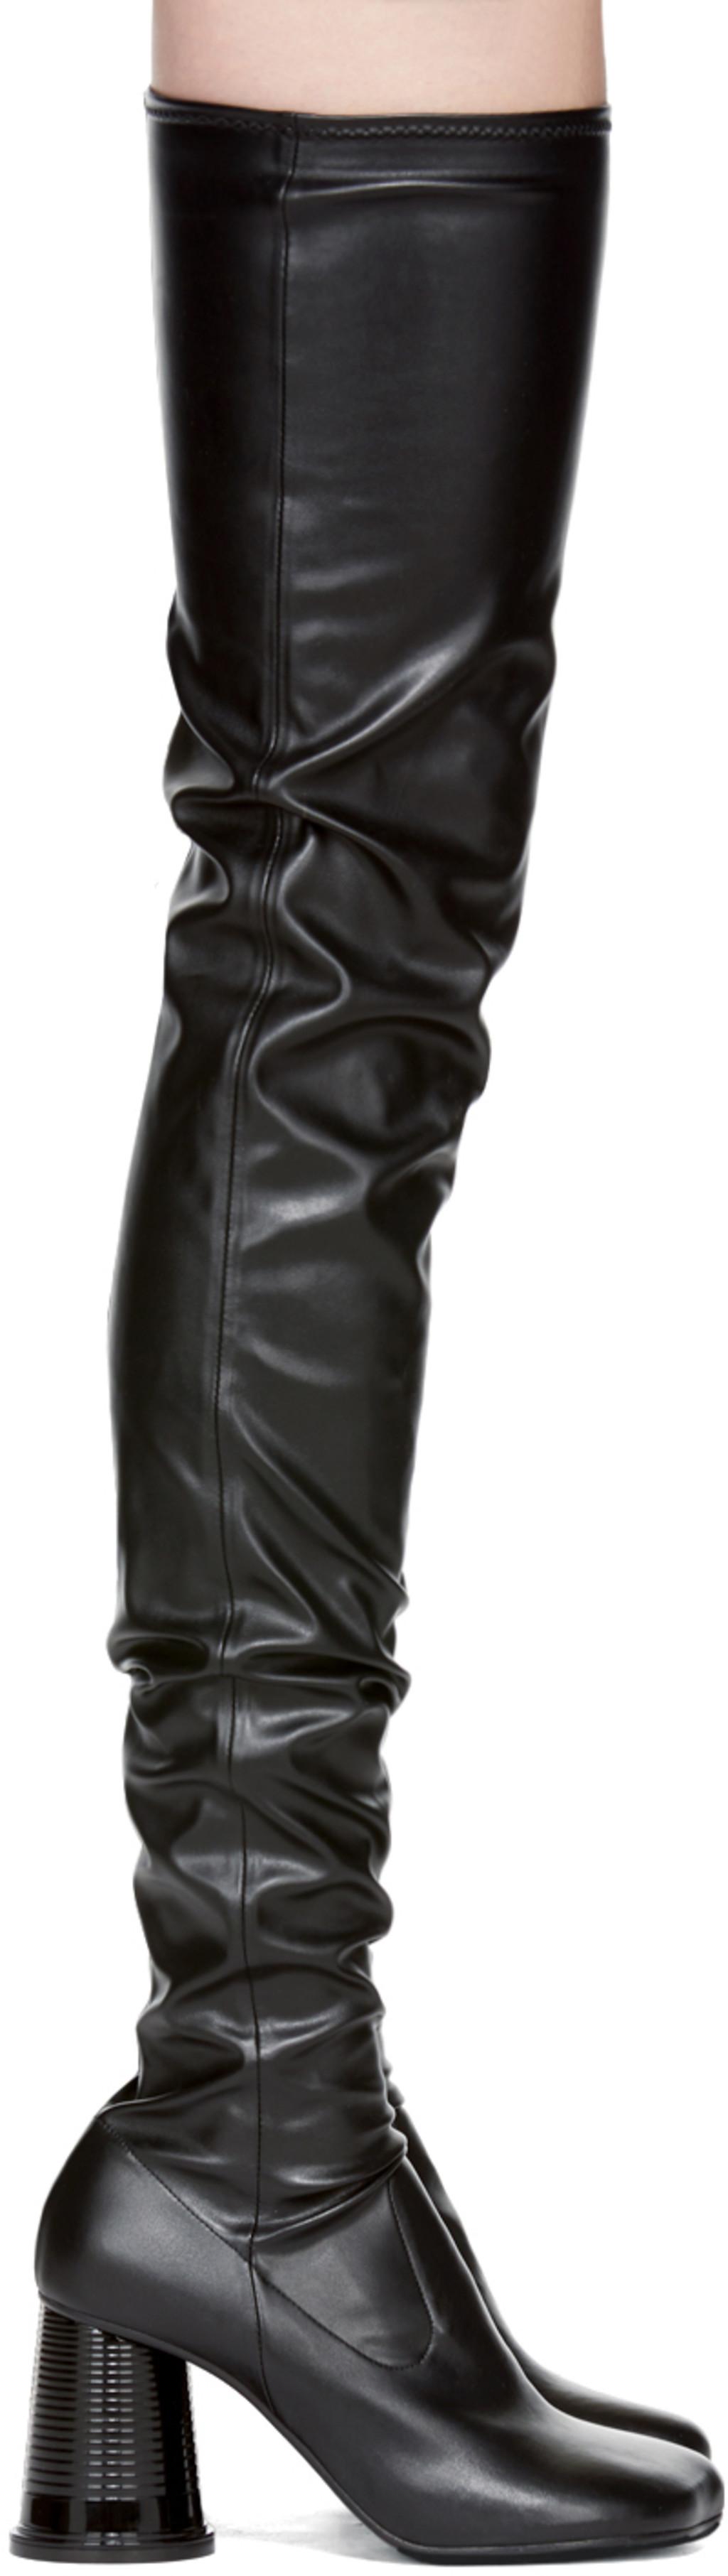 Burberry Black Ballerina Over-the-Knee Boots